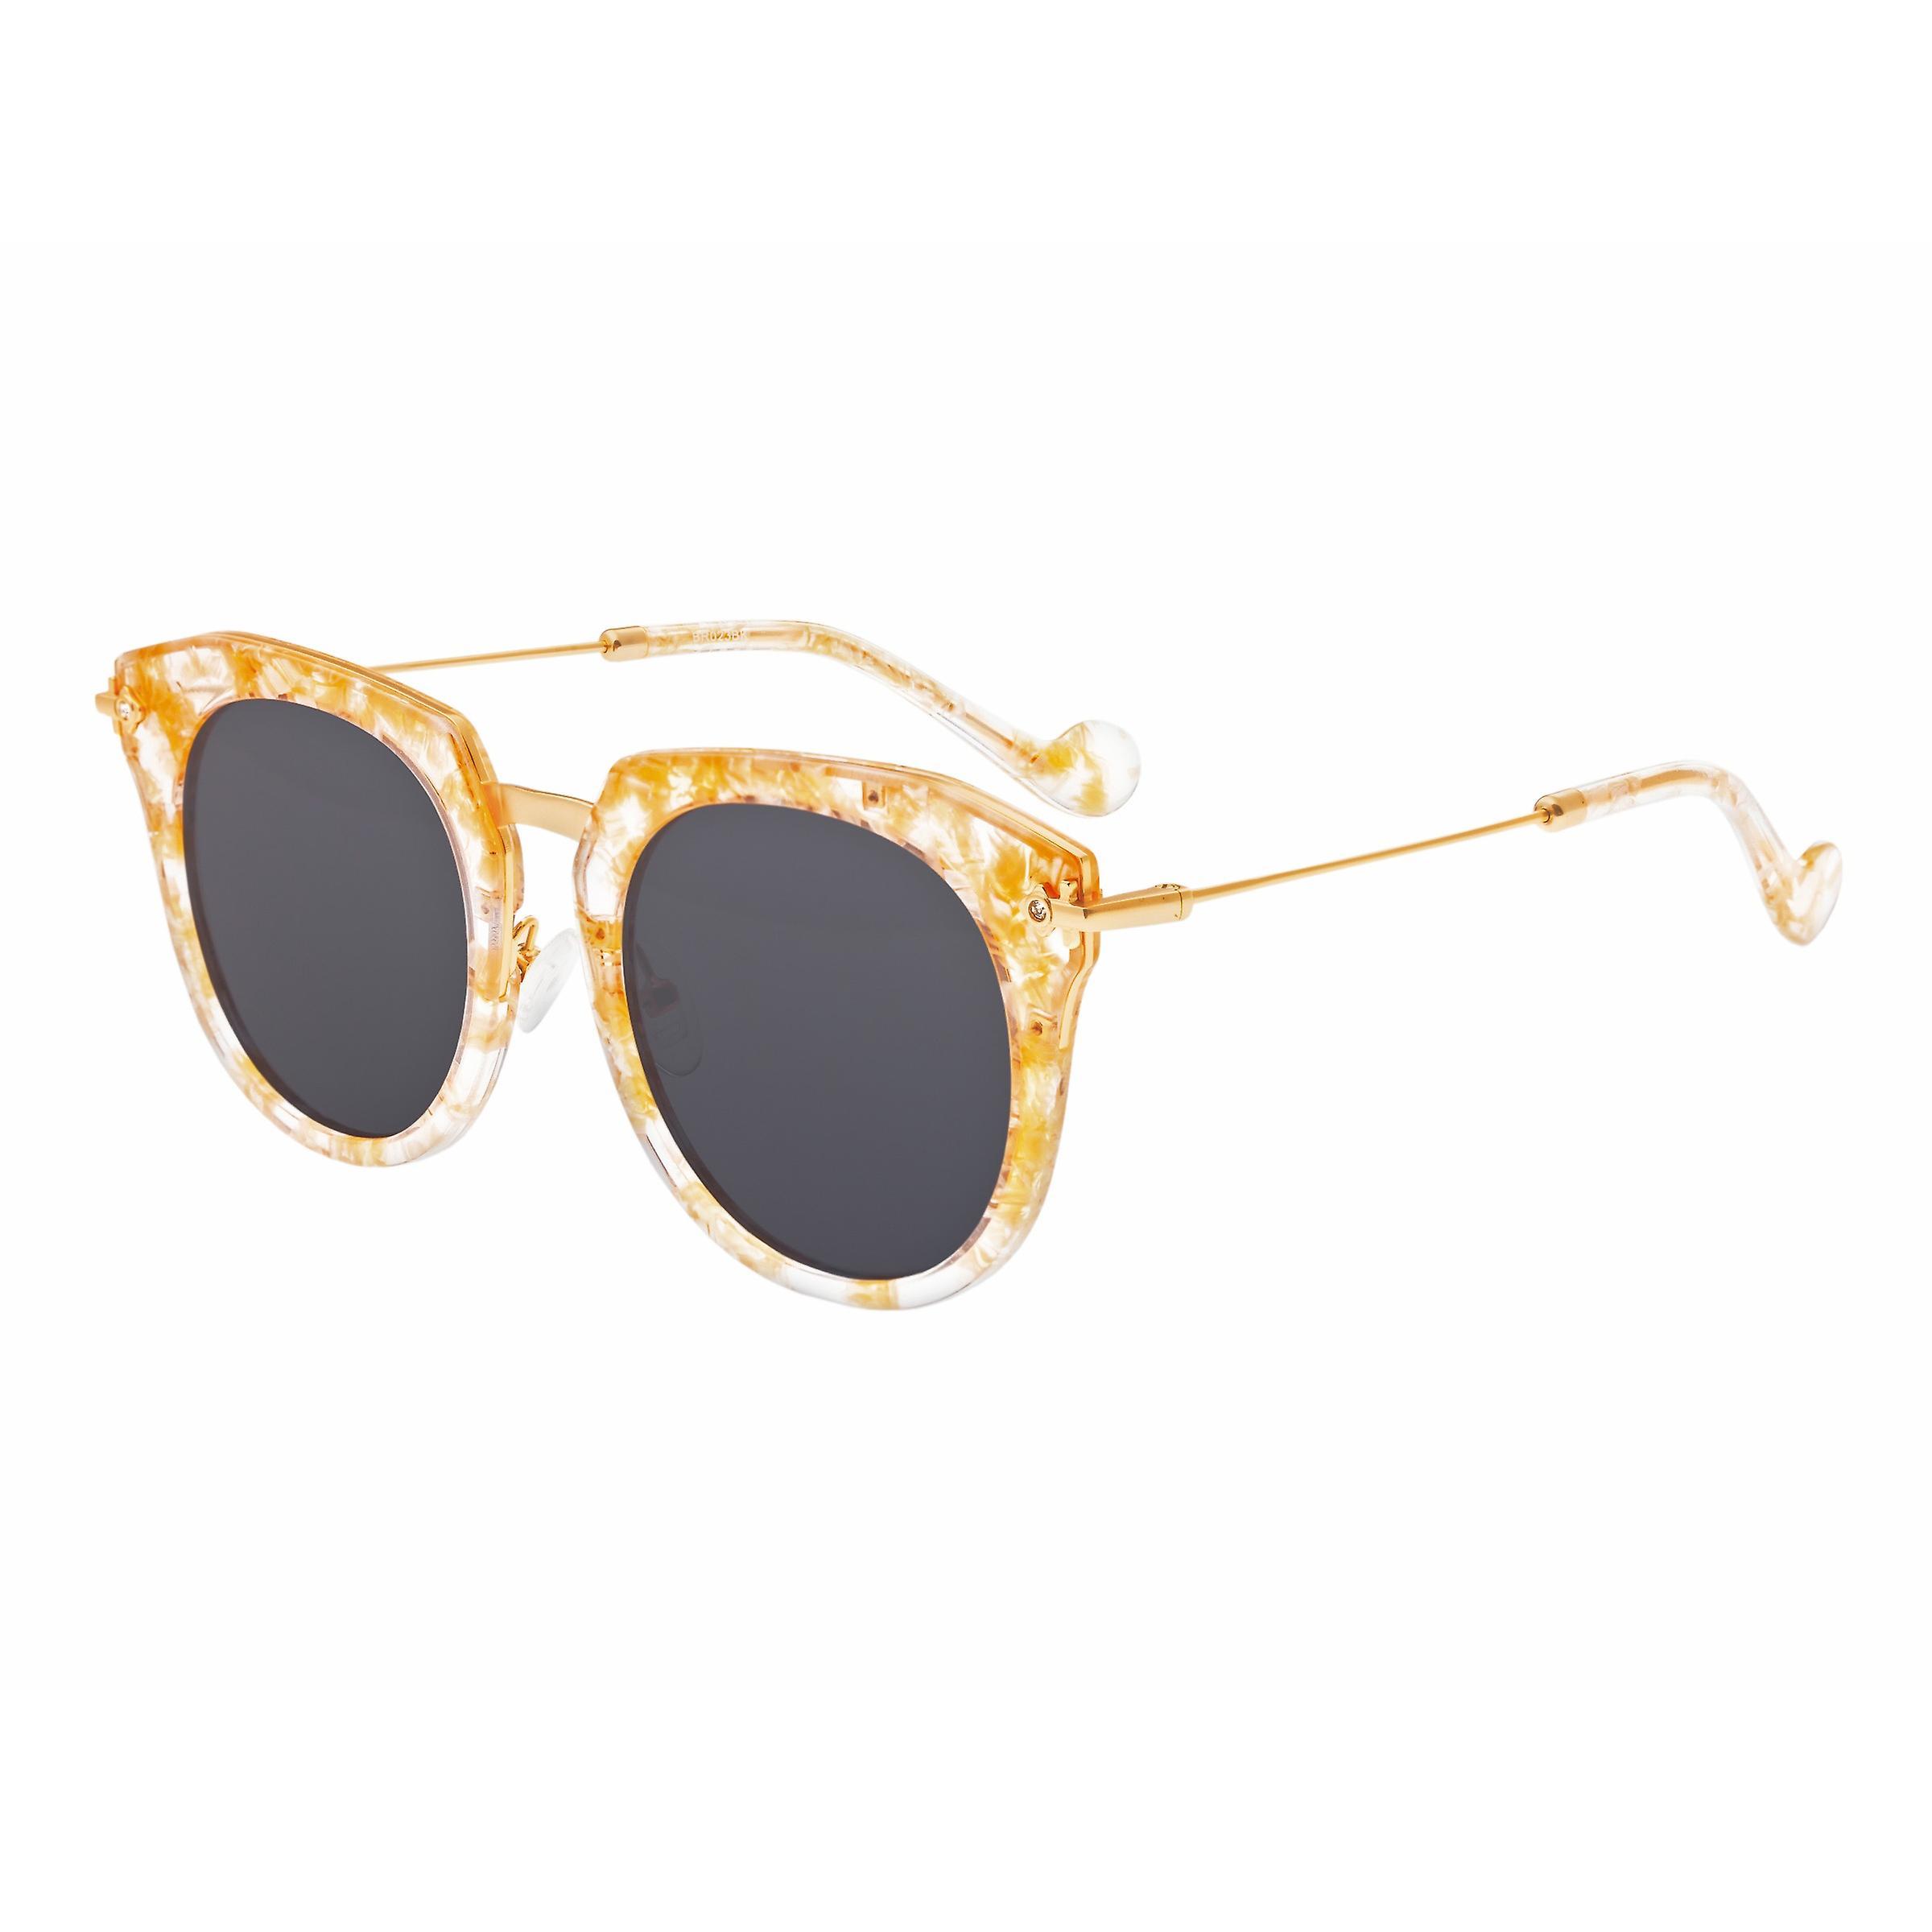 Bertha Aaliyah Polarized lunettes de soleil - Peach Tortoise noir